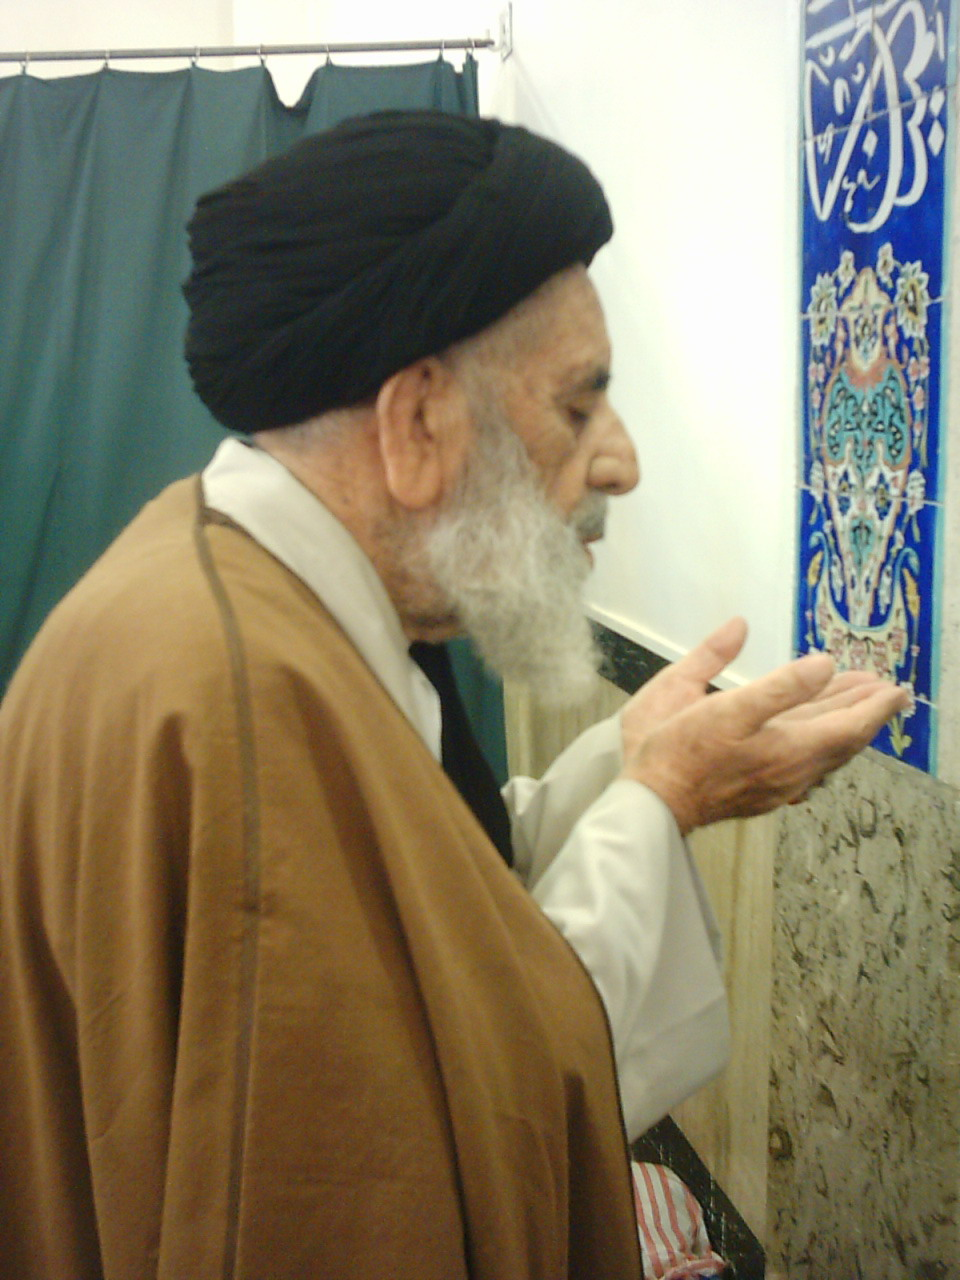 http://sadri87.persiangig.com/image/Sadri/Sadri_9.jpg